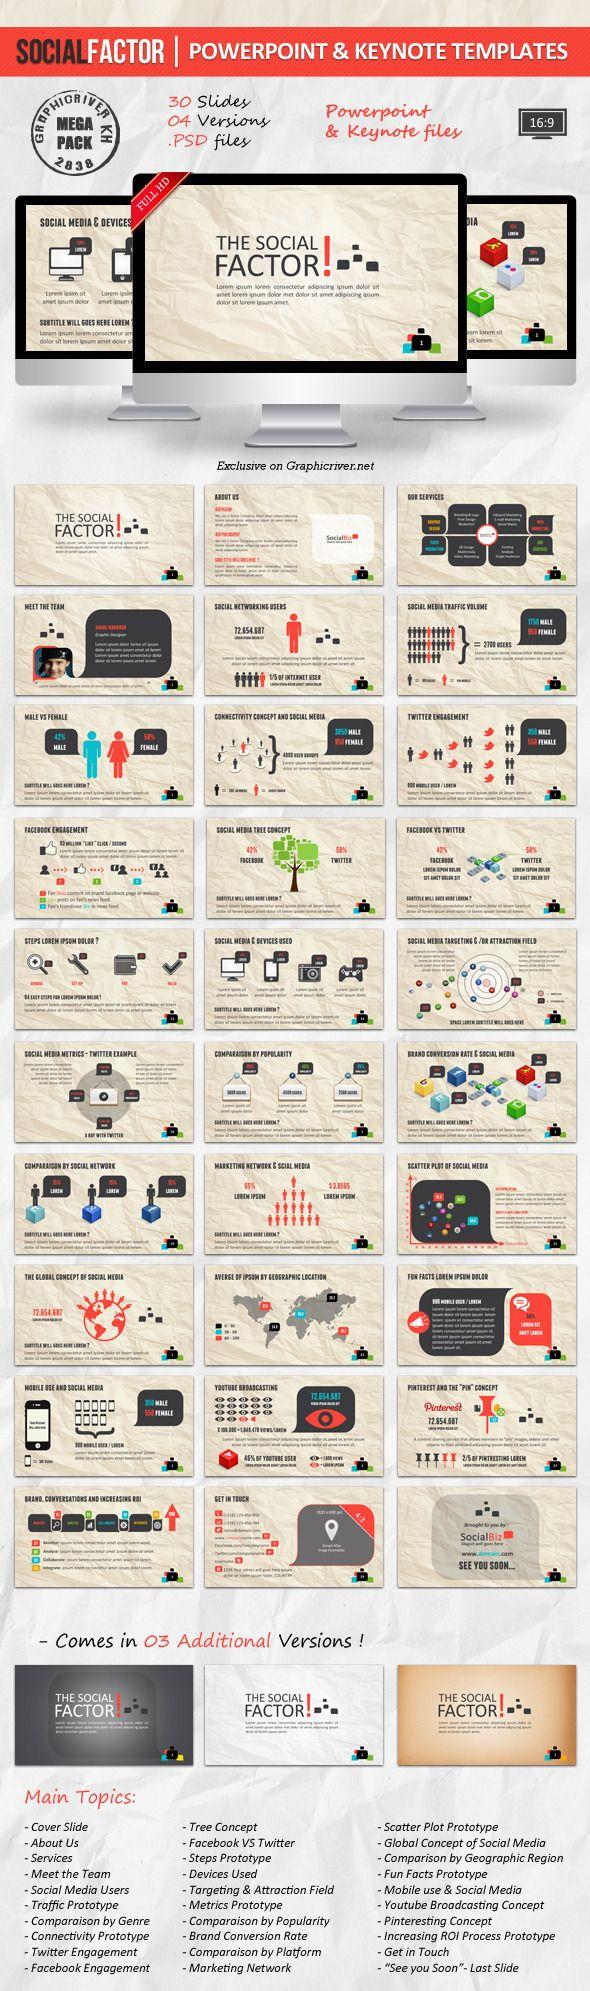 SocialFactor Powerpoint and Keynote Templates - Presentation Templates